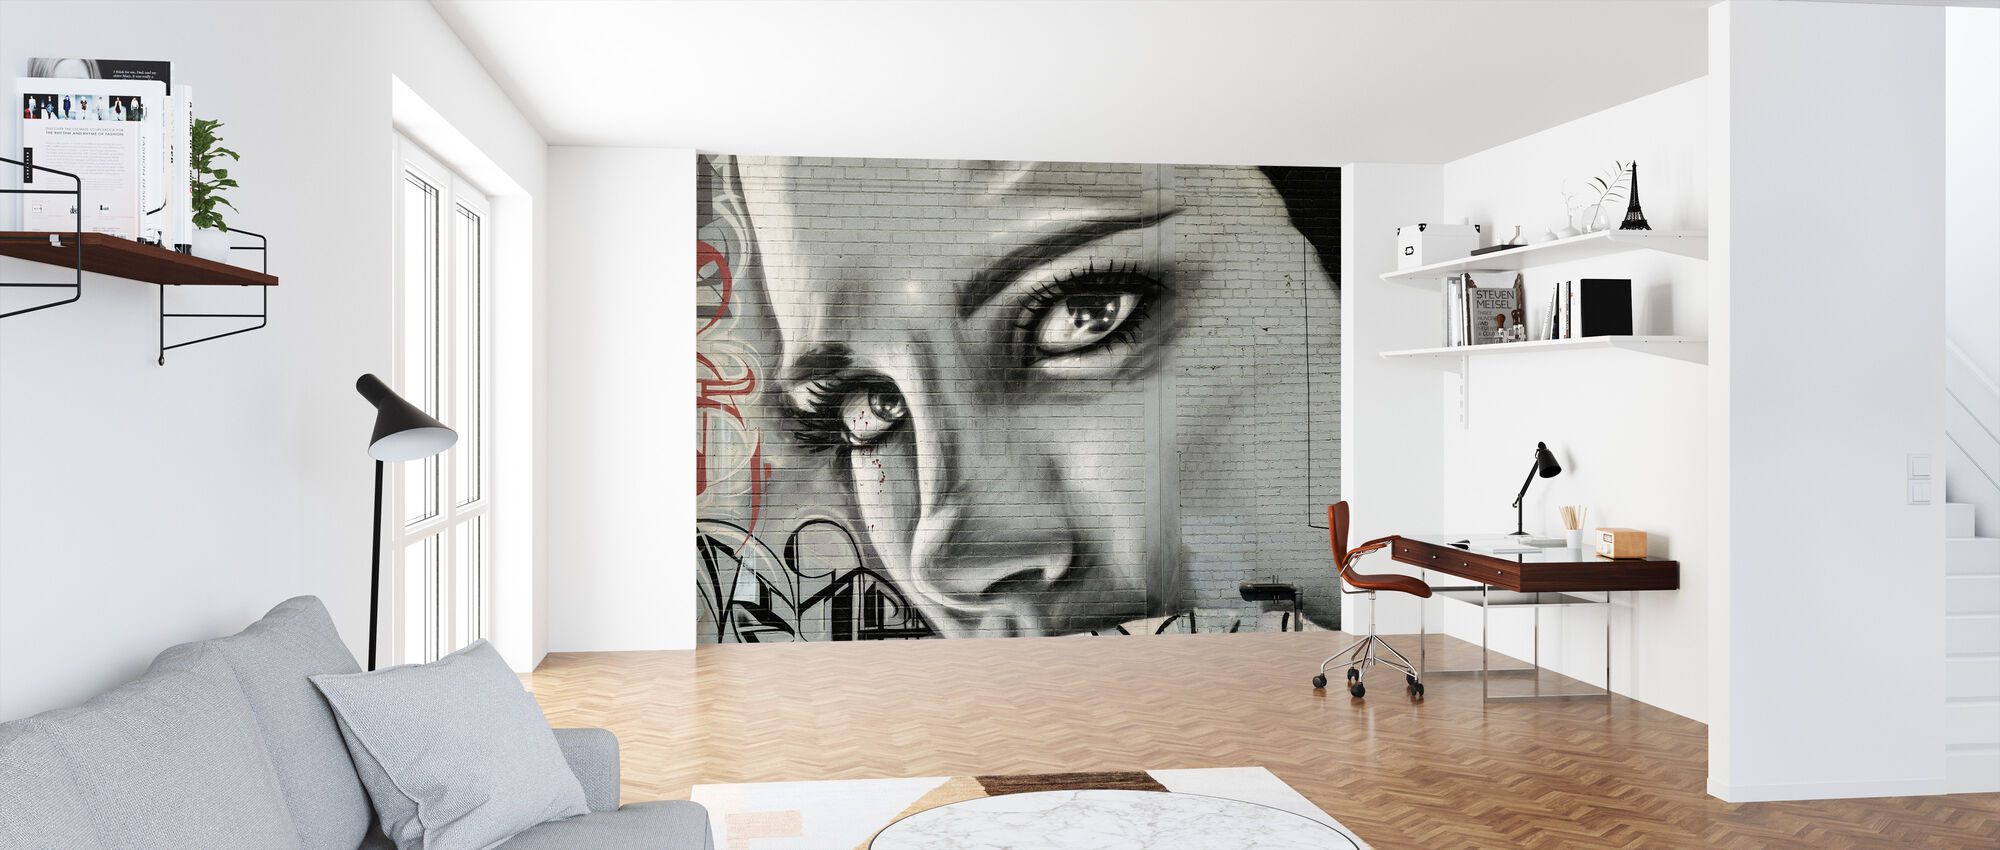 Woman's Face Graffiti Wall - Wallpaper - Office